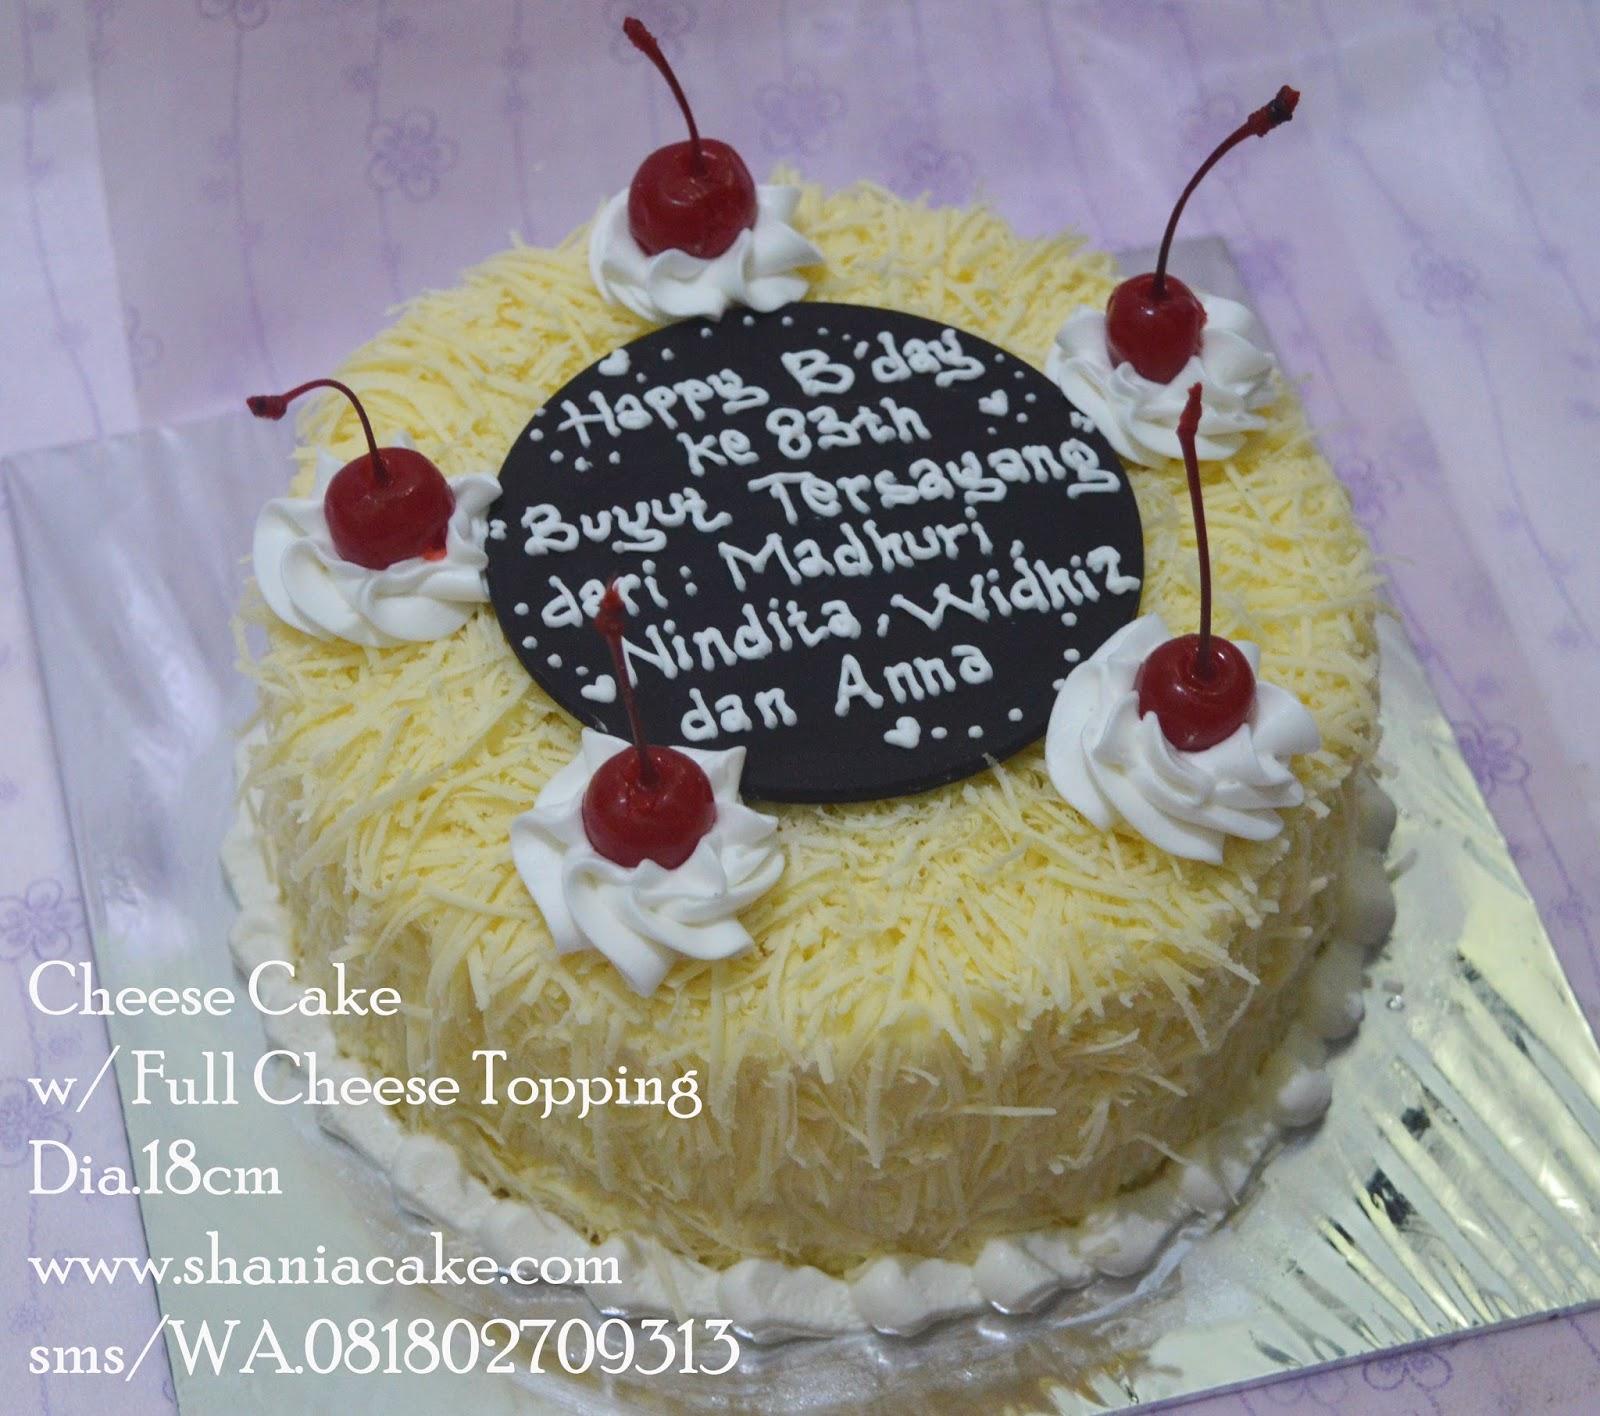 Birthday Cake Jogja Cheese Cake Dr Mba Widhi Bandung Untuk Keluarga